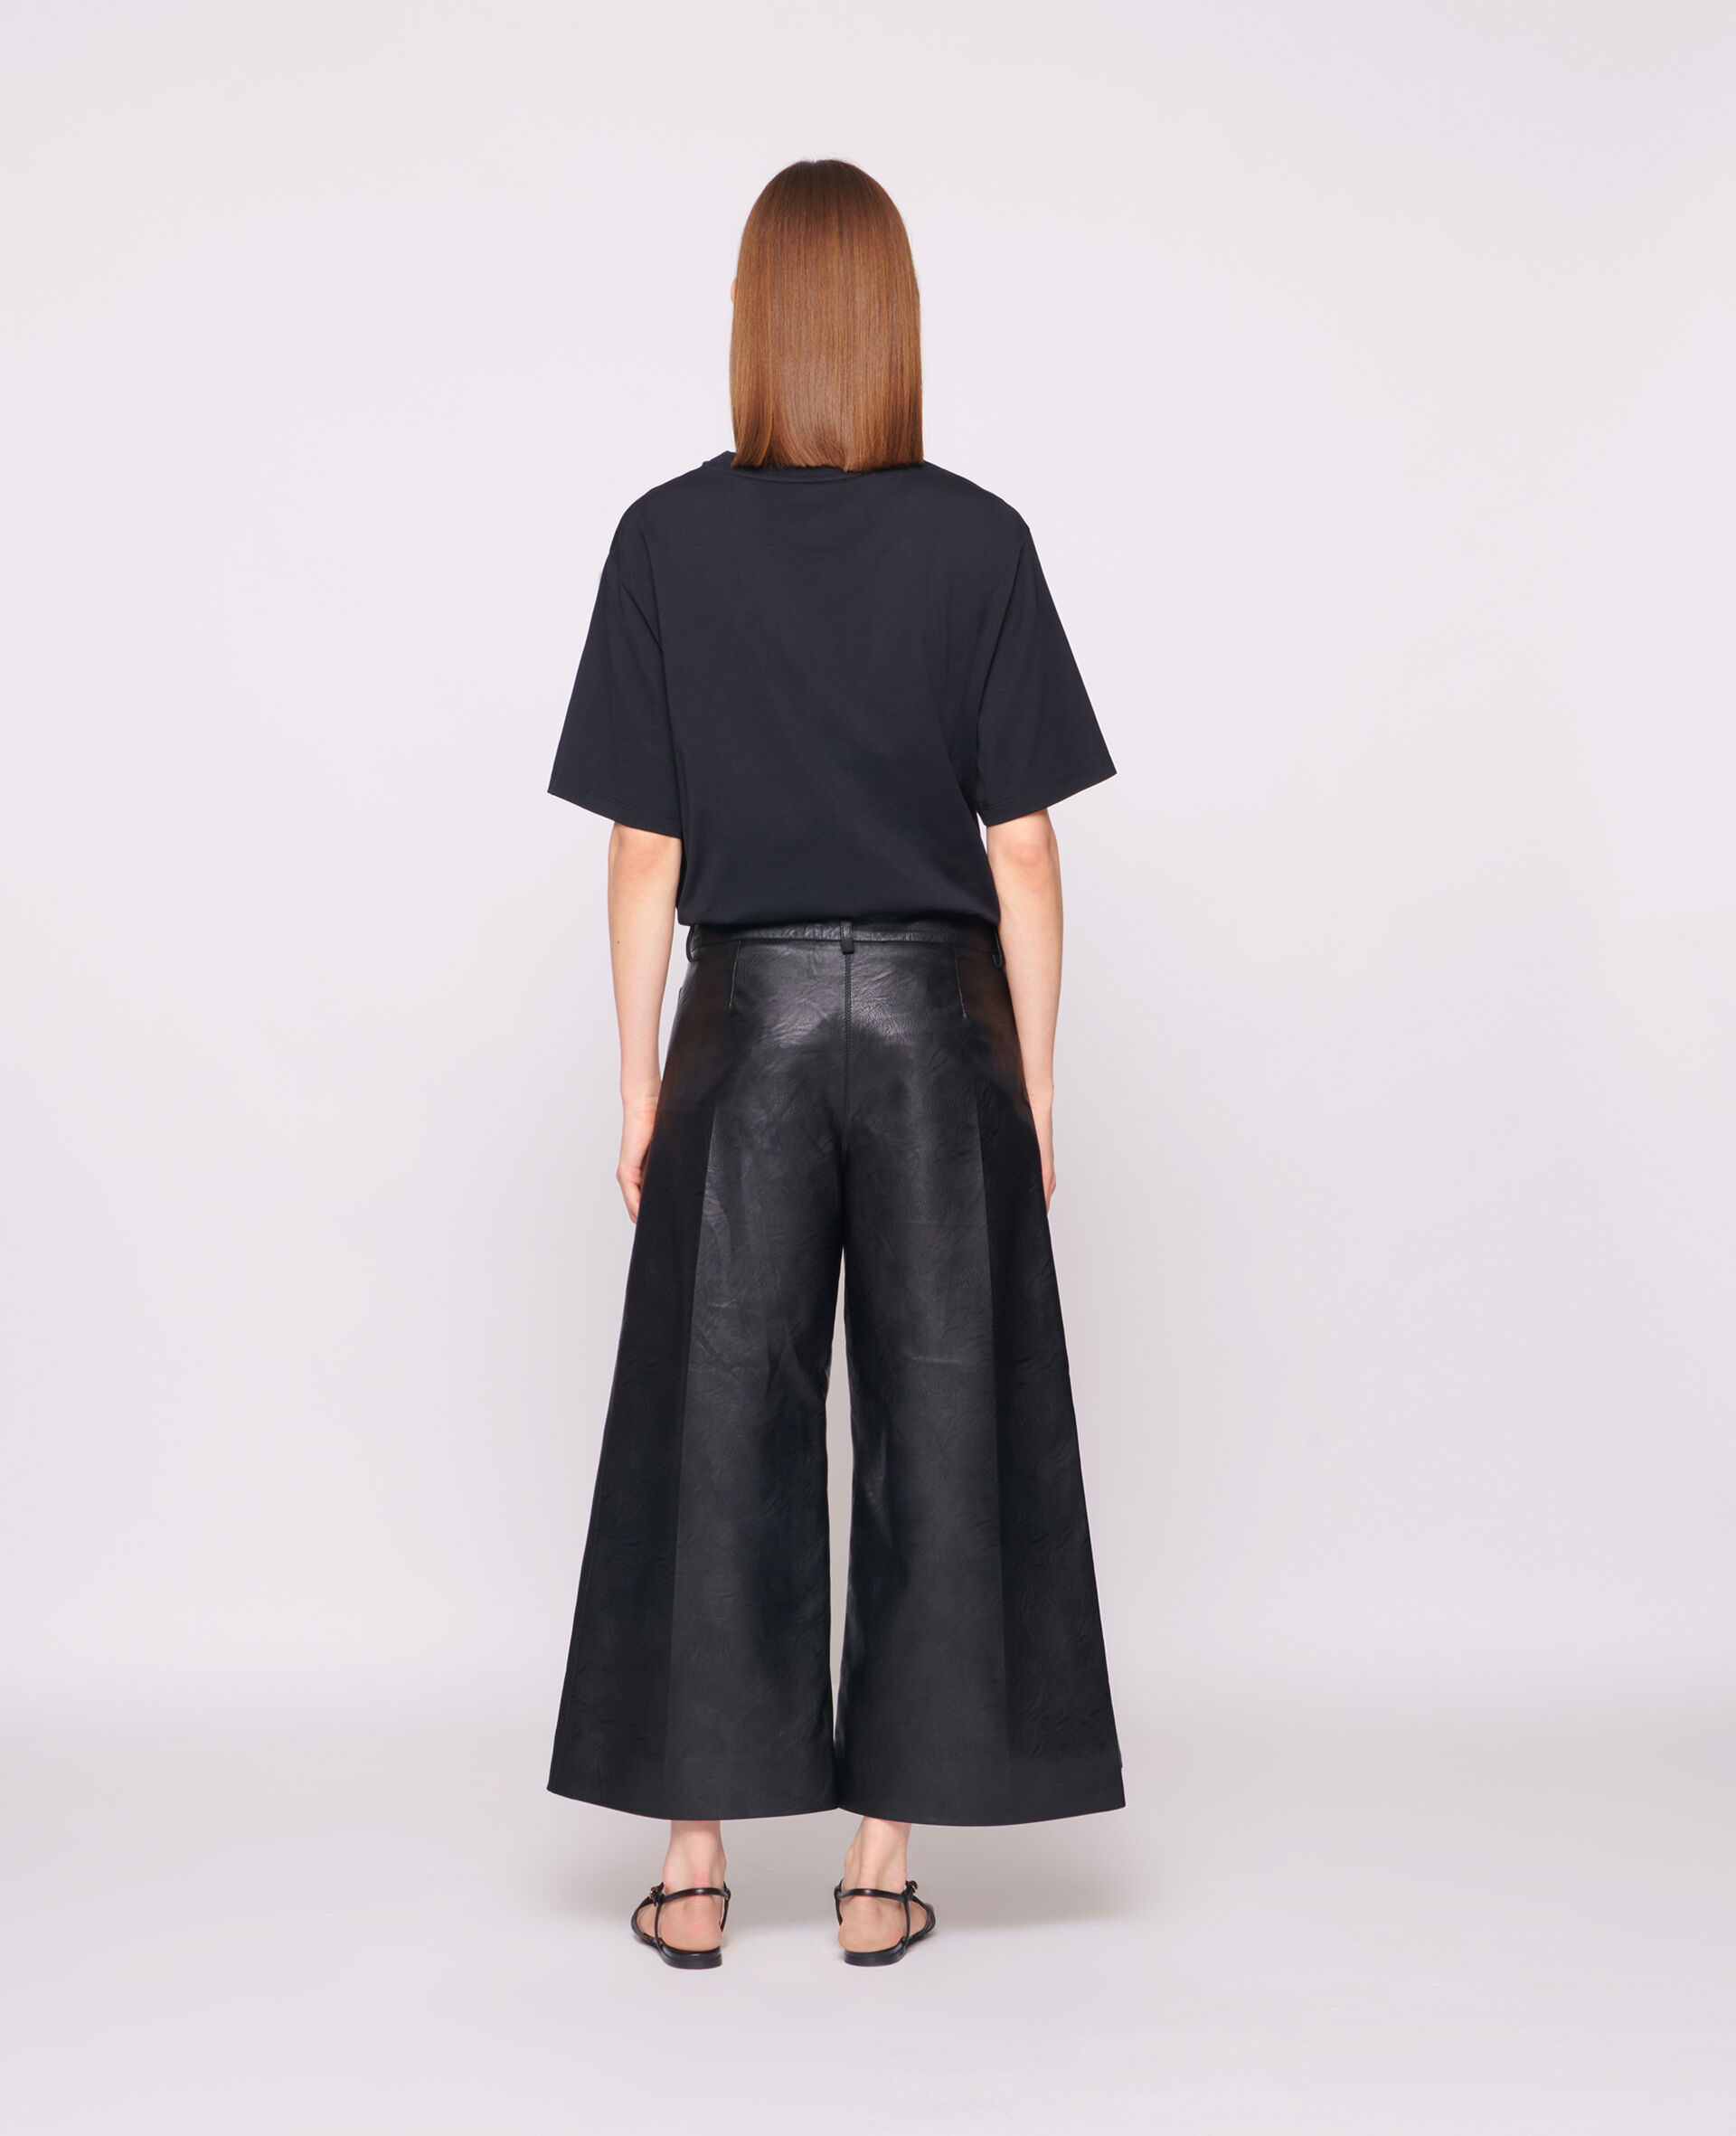 T-shirt 23 OBS en coton biologique-Noir-large image number 2